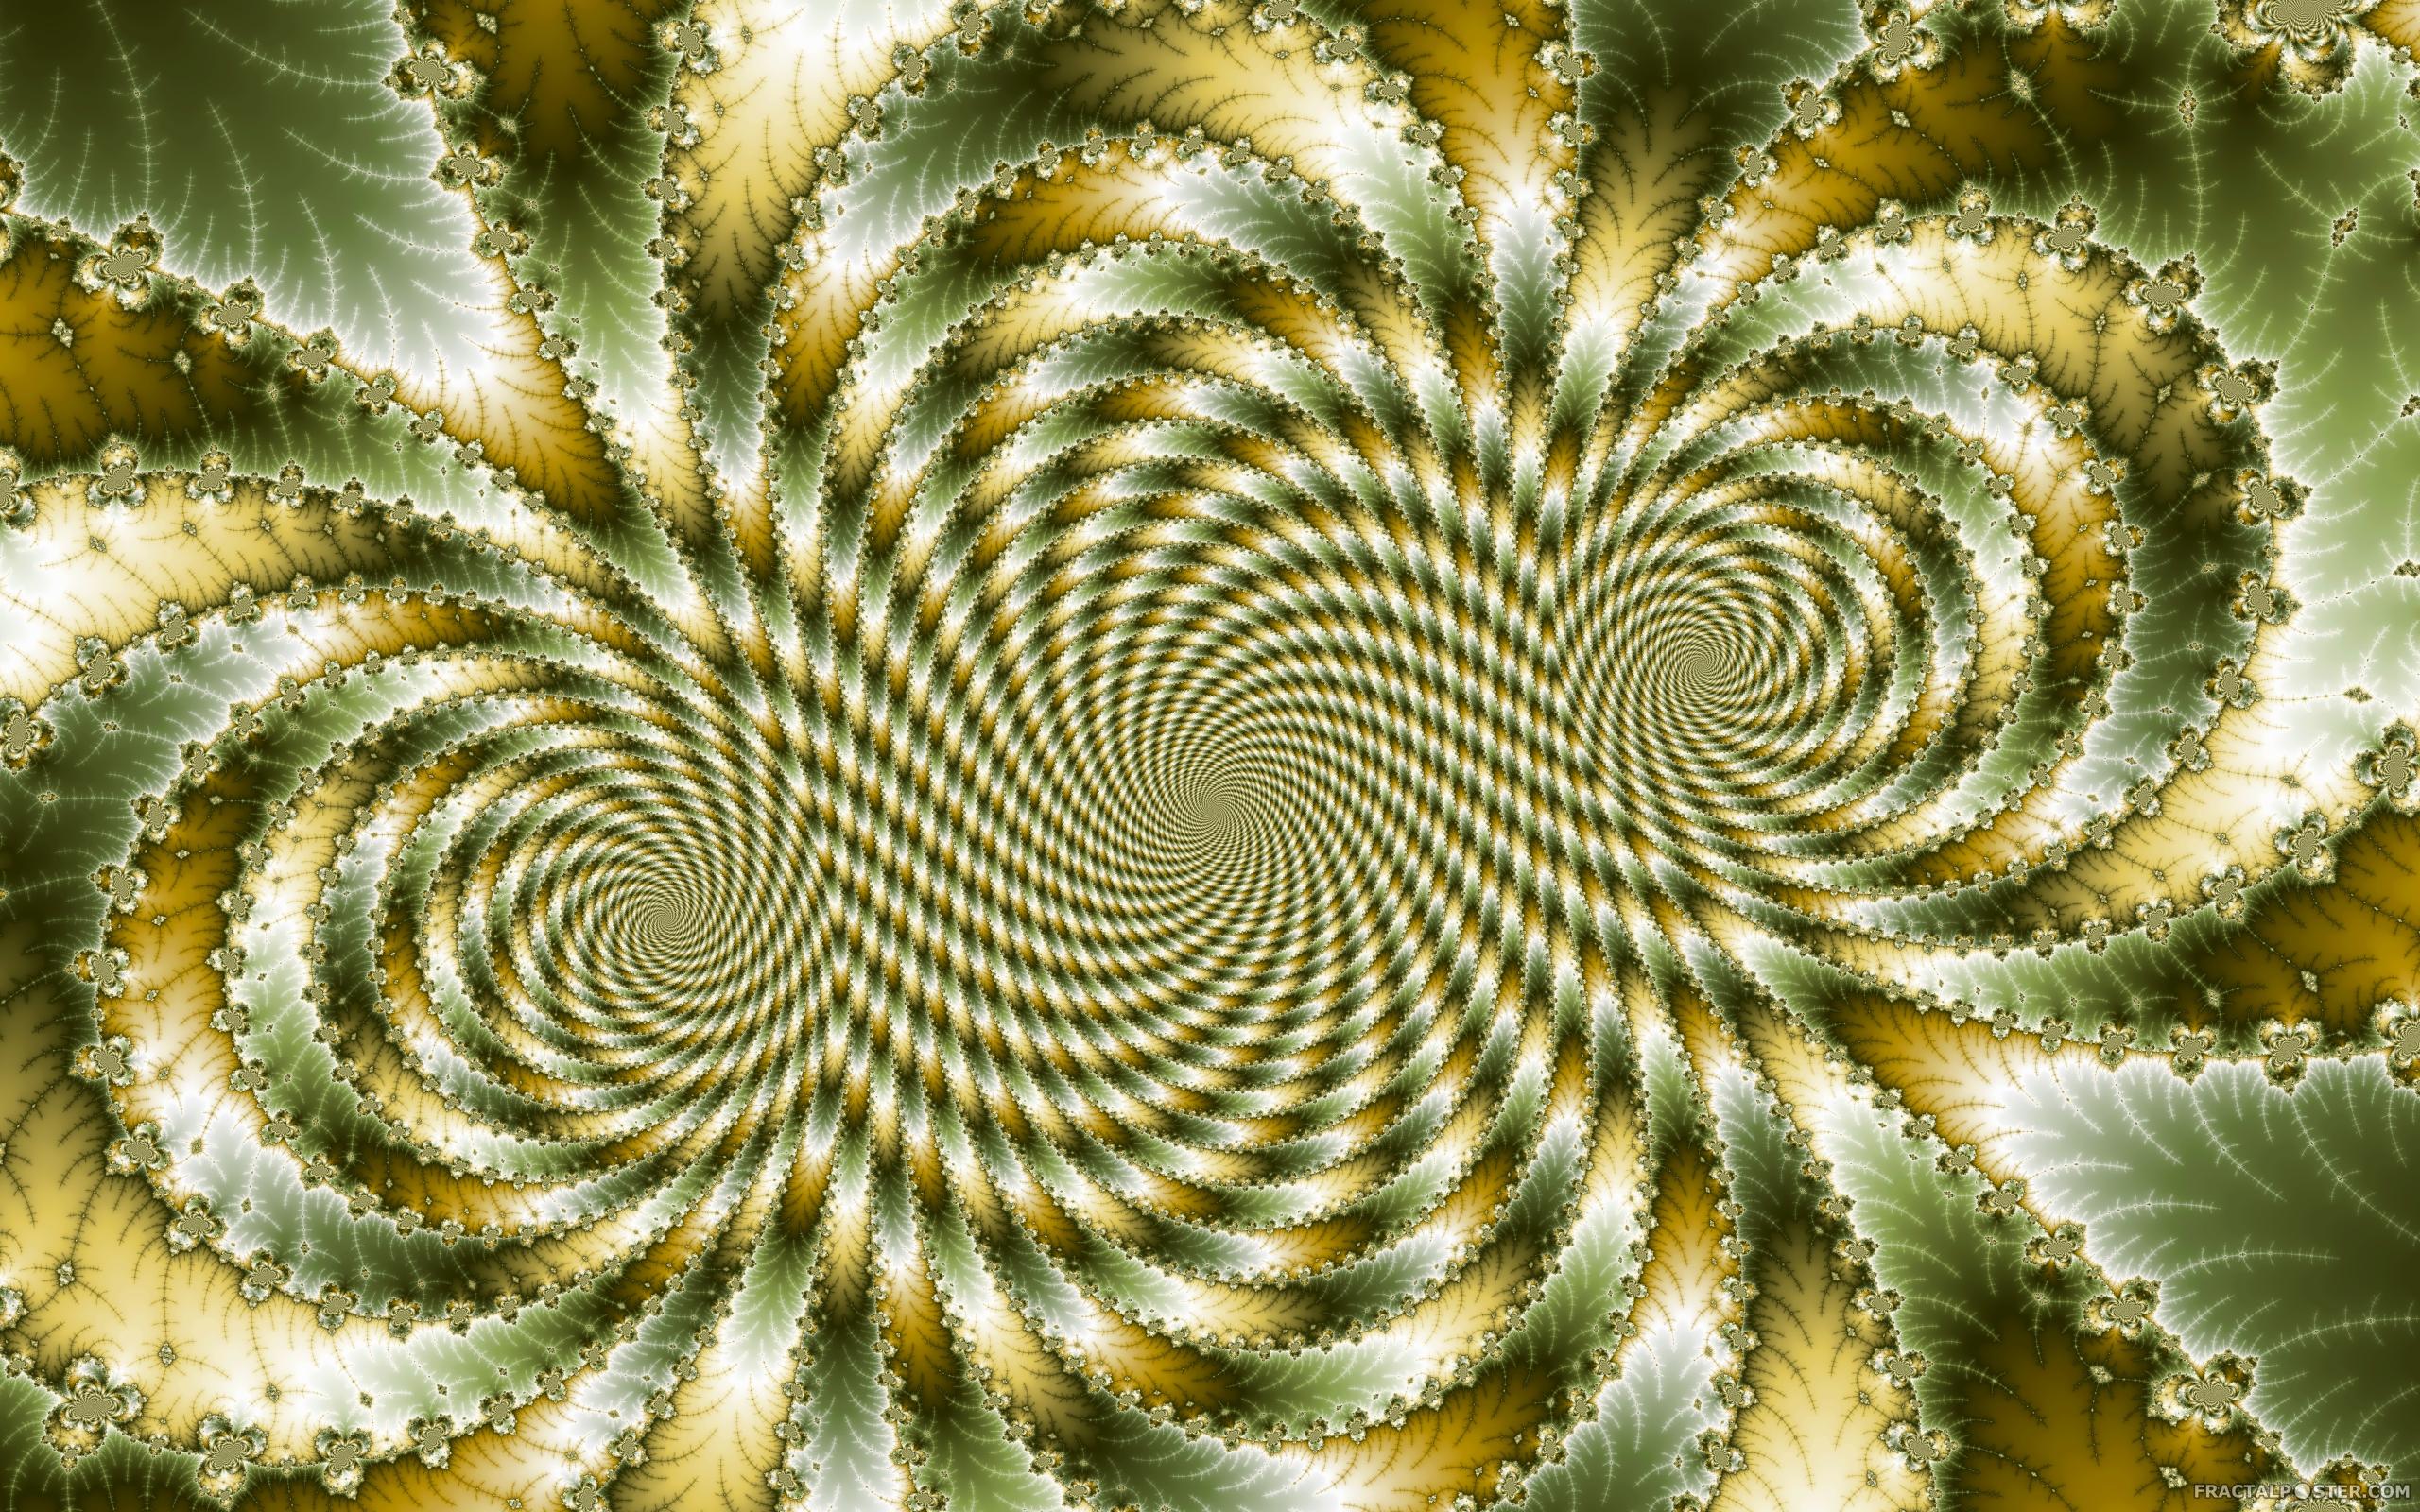 1280x960 fractals 2560x1600 - photo #47